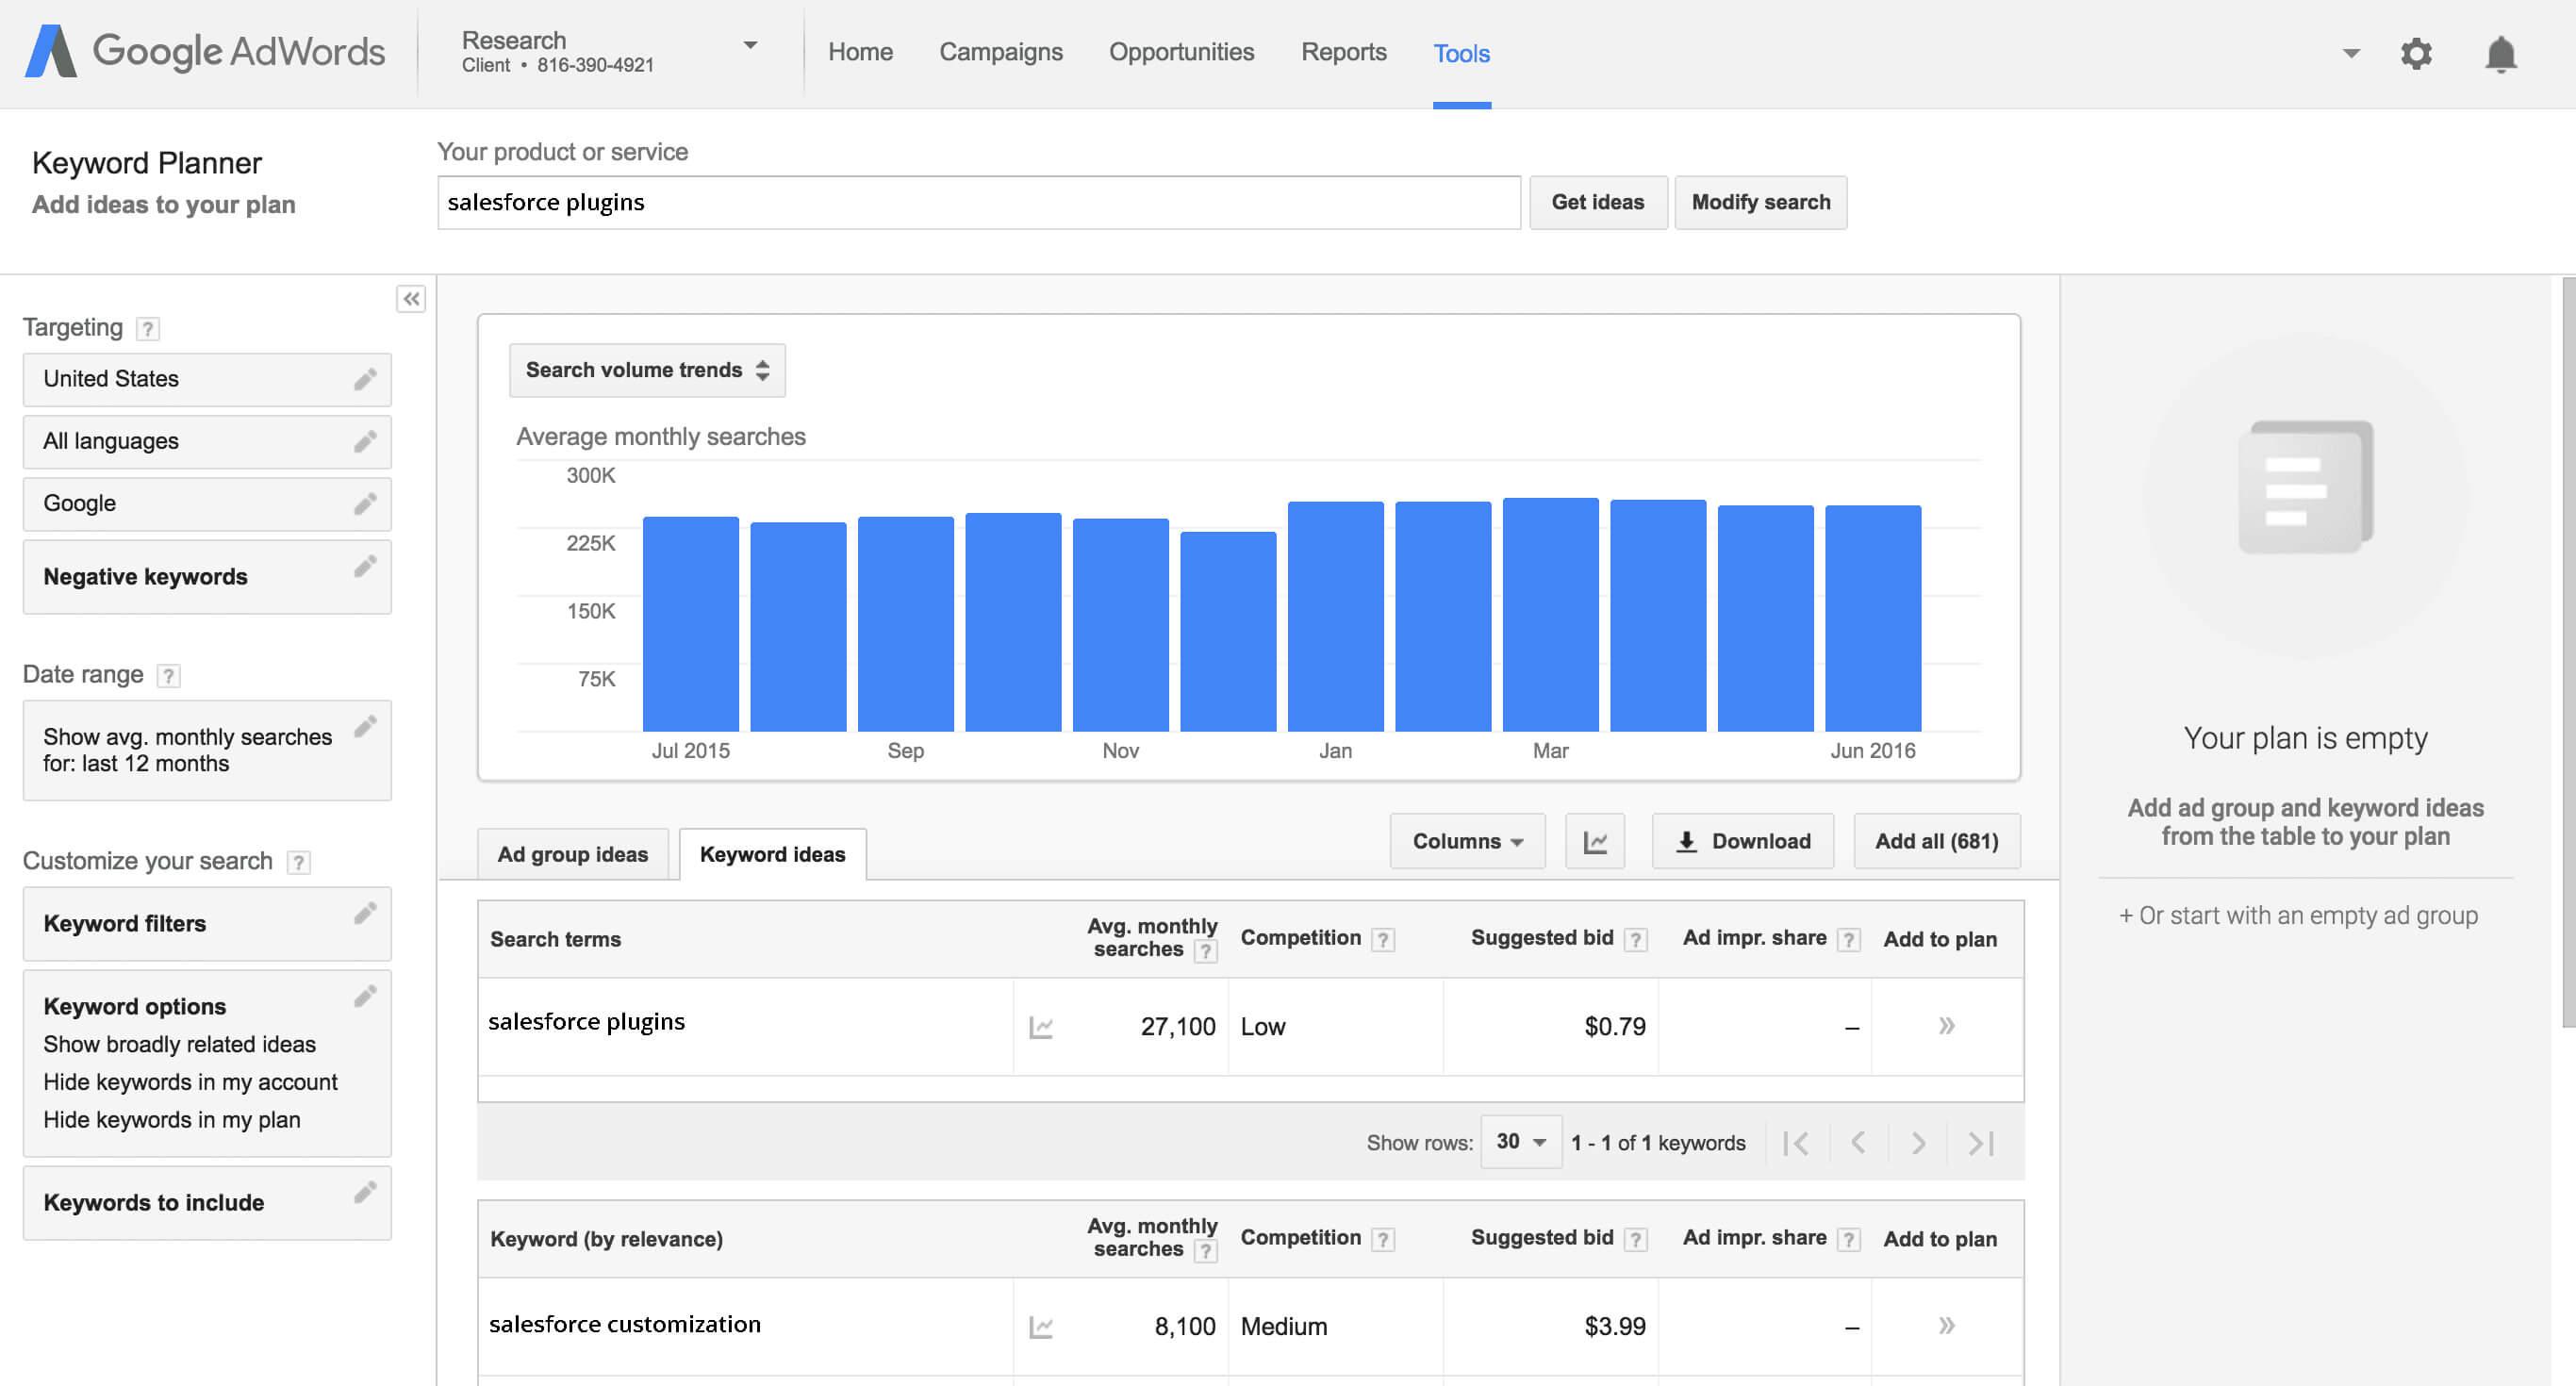 Google Ads для IT: сценарии развития